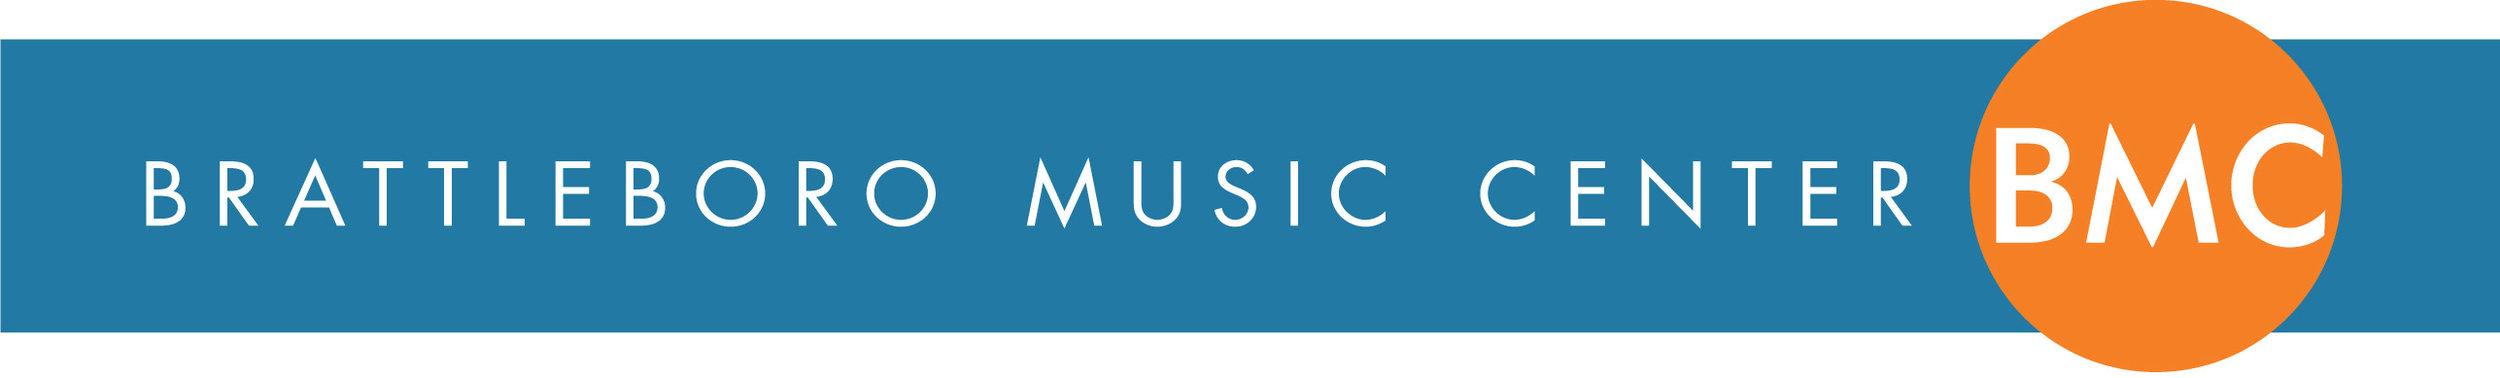 BMC_logo_band cropped.jpg